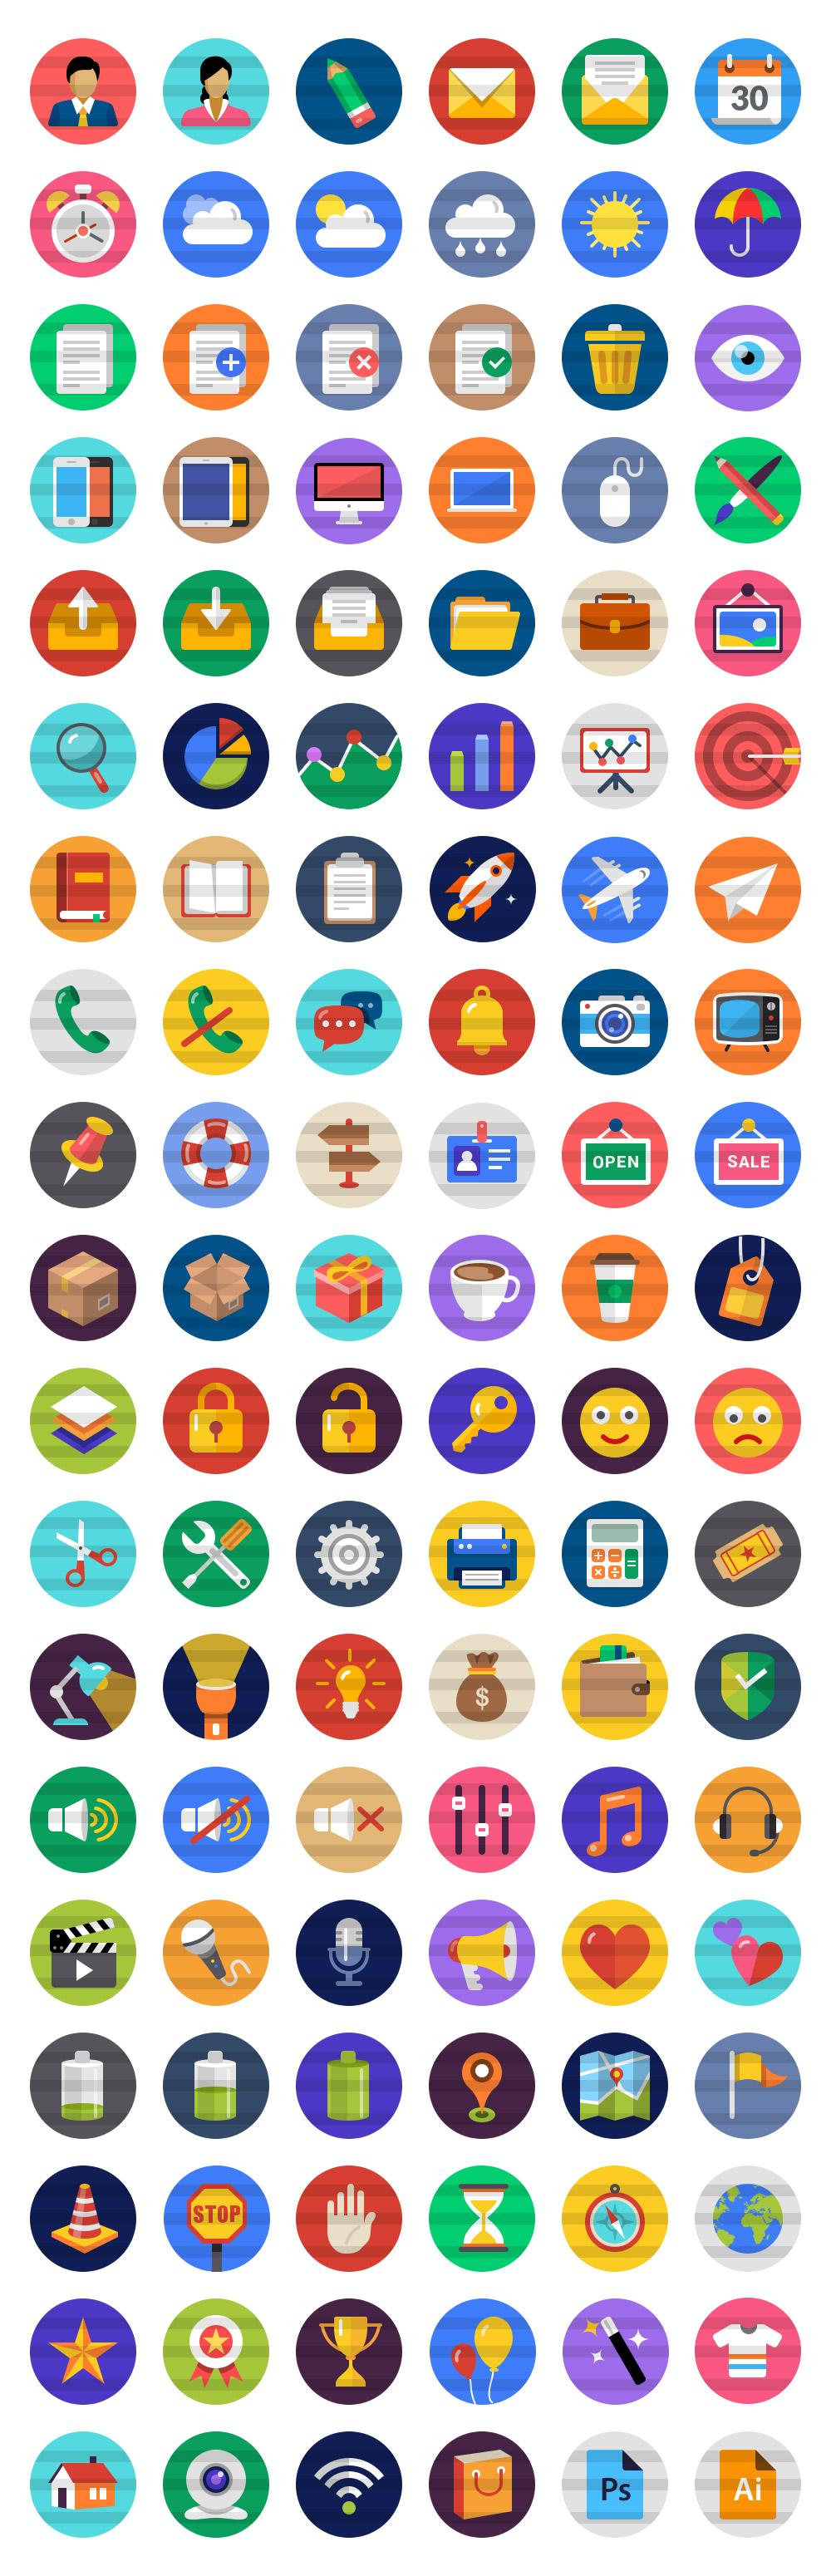 114 Flat Round Icons